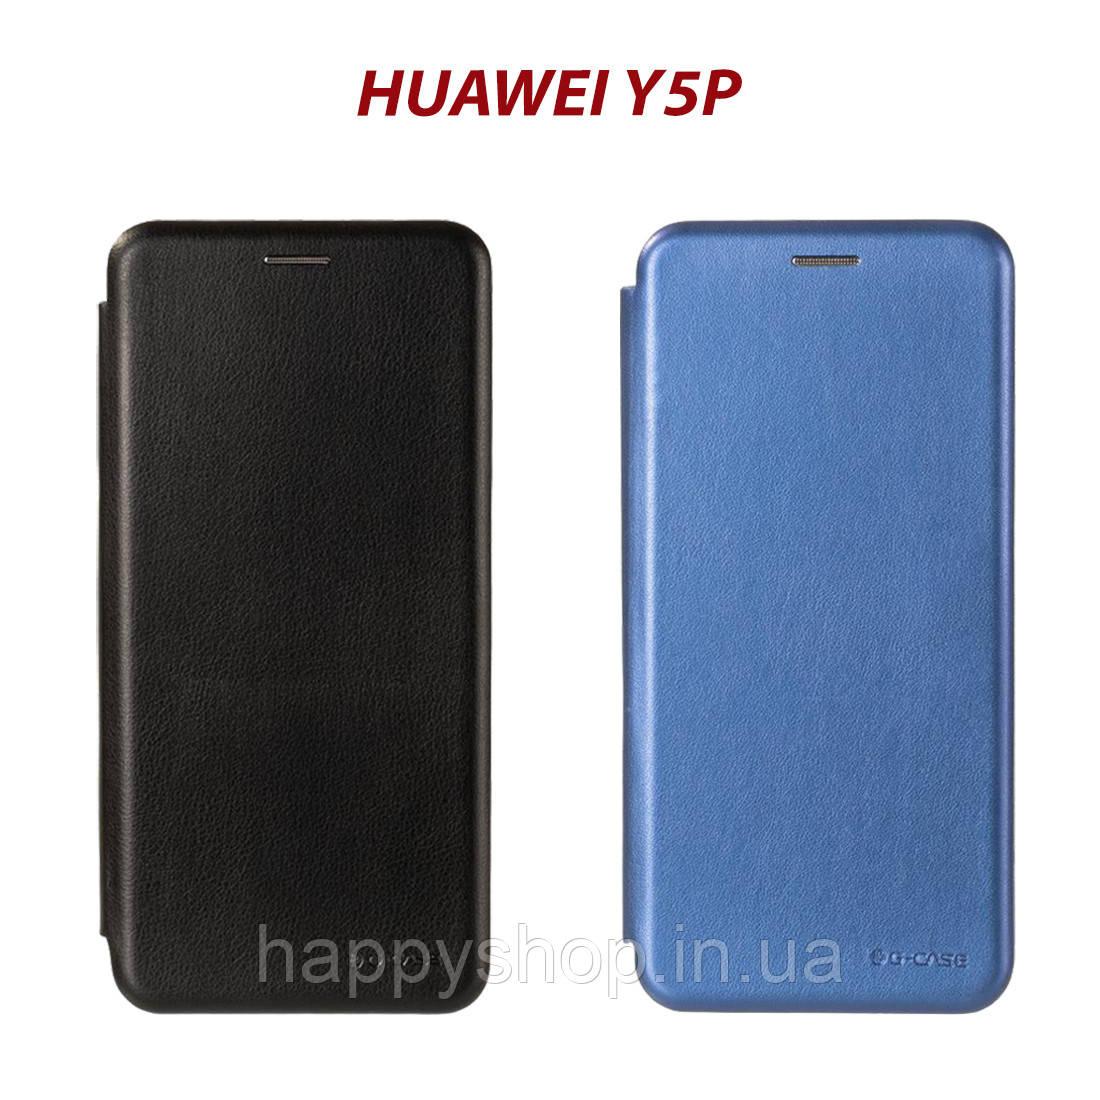 Чехол-книжка G-Case для Huawei Y5P